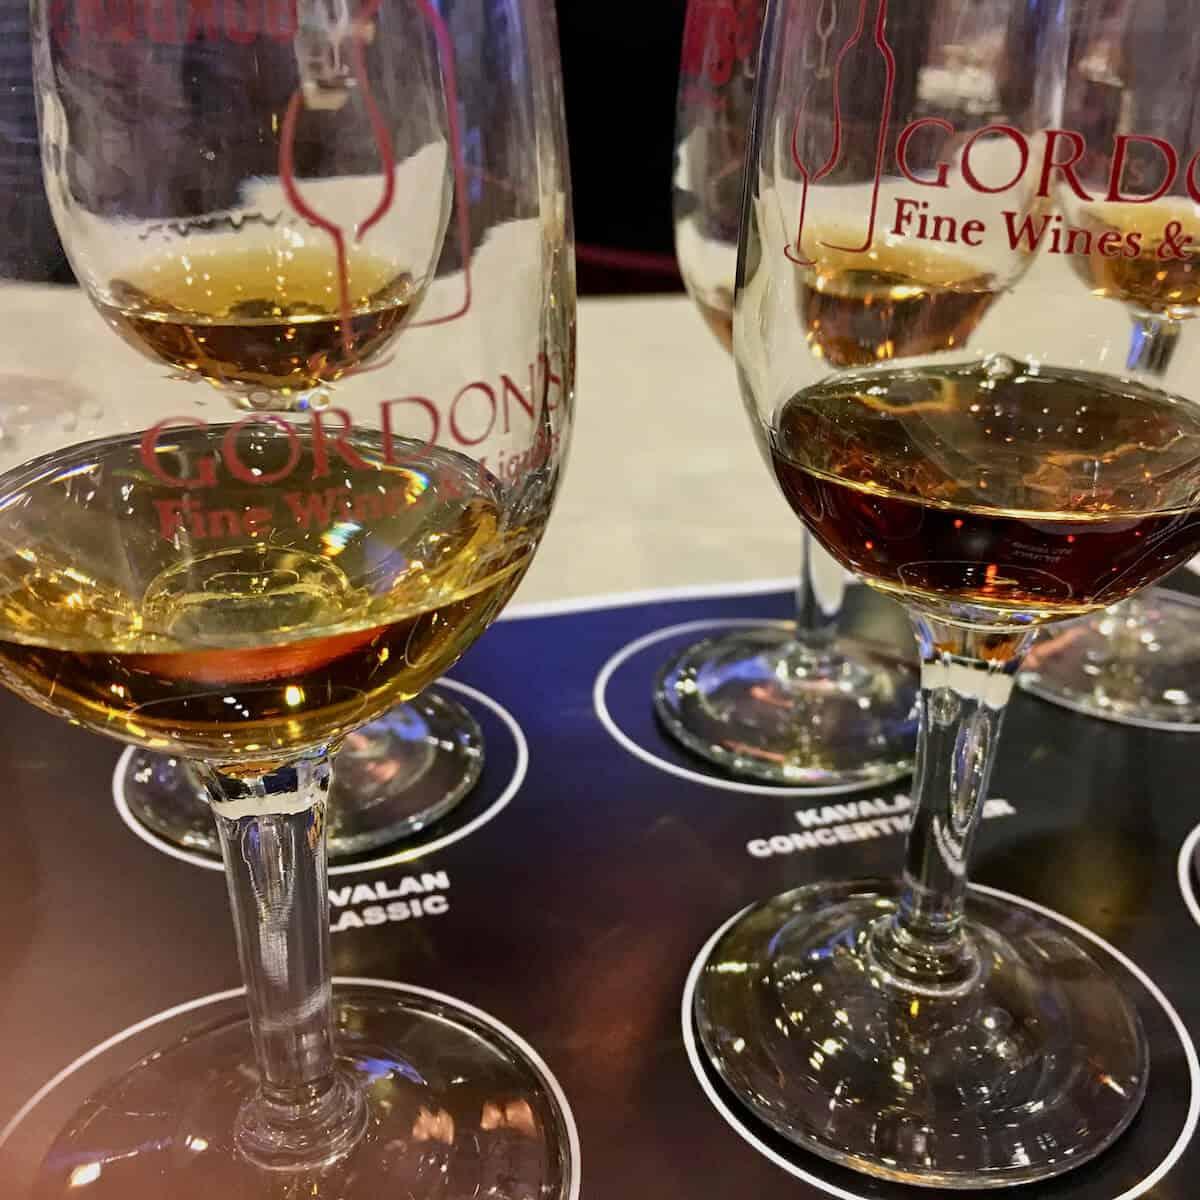 Kavalan whisky seminar tasting lineup in glasses on a sample mat.